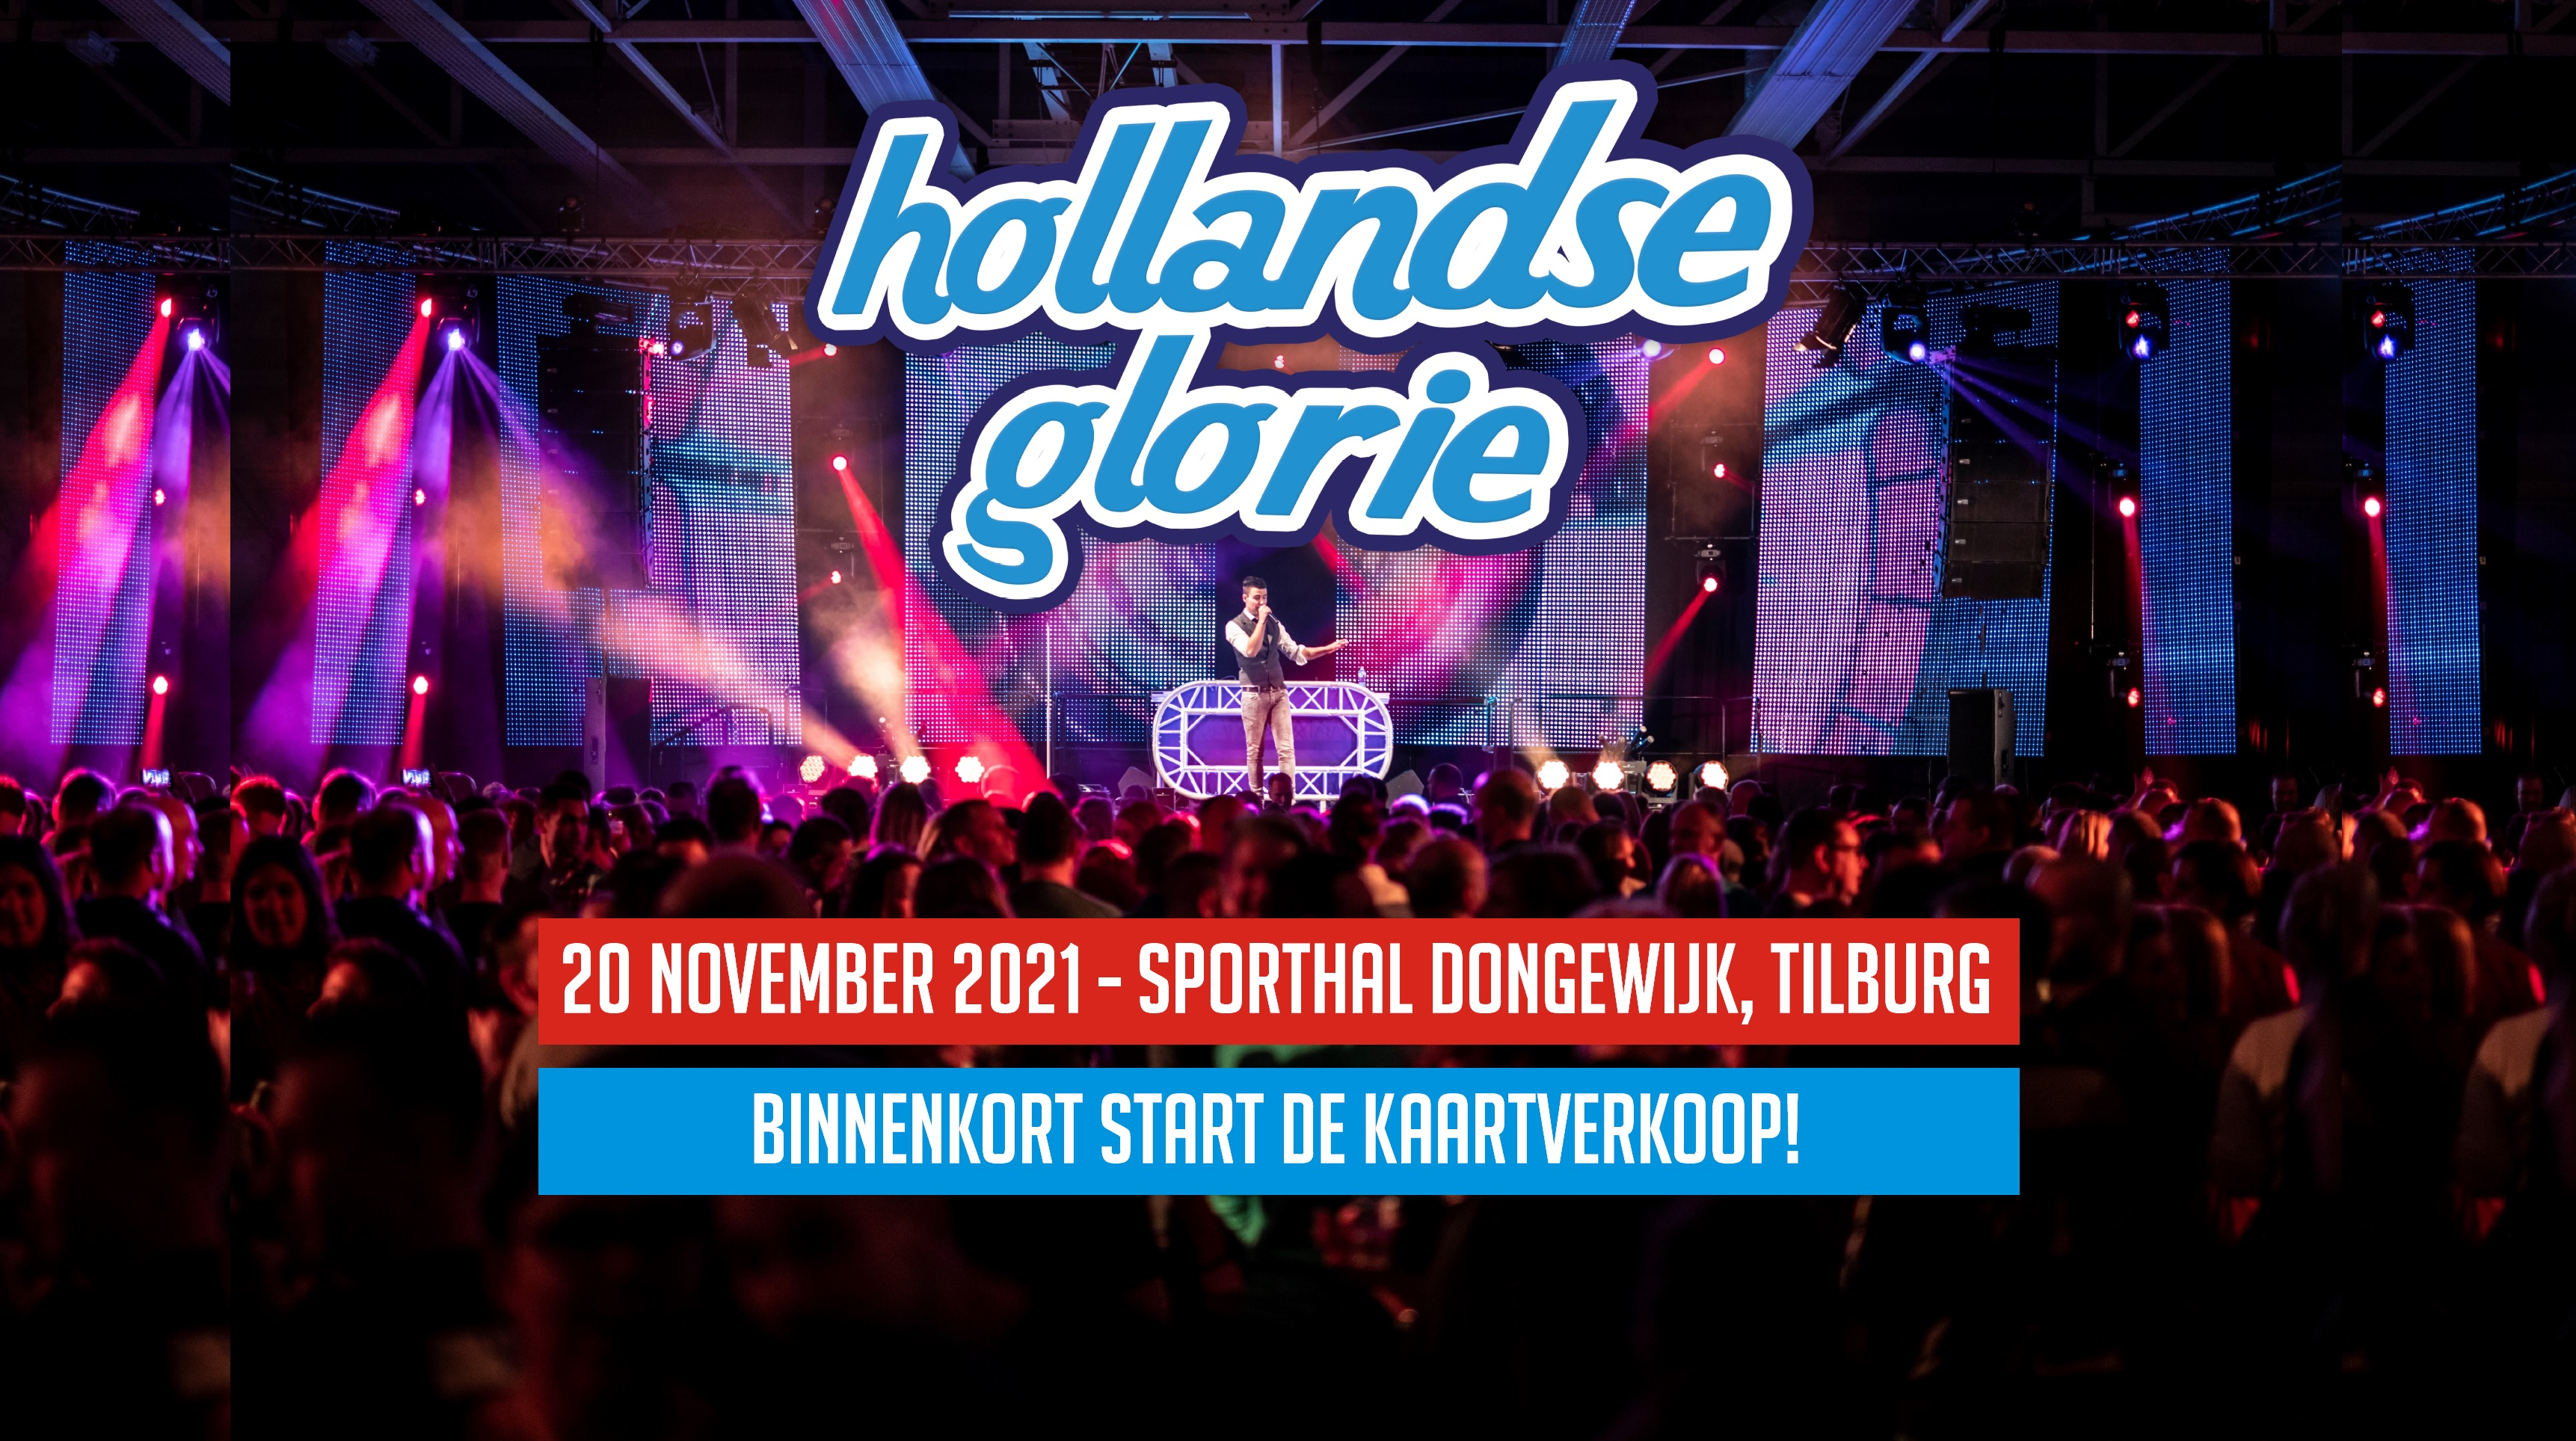 Website-Hollandse-Glorie-1920x1080